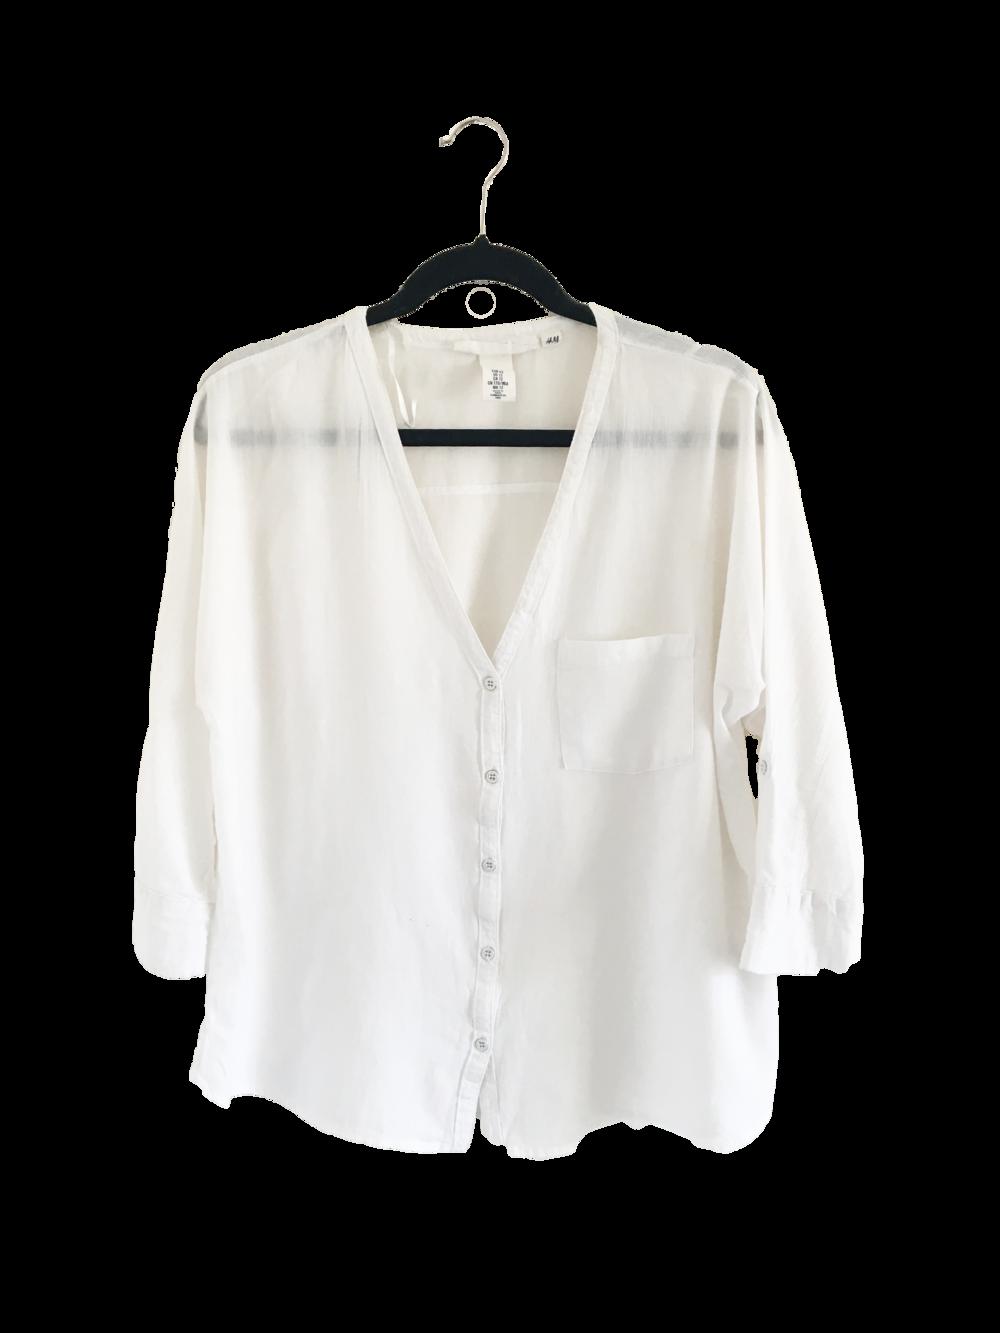 White Button Shirt.png